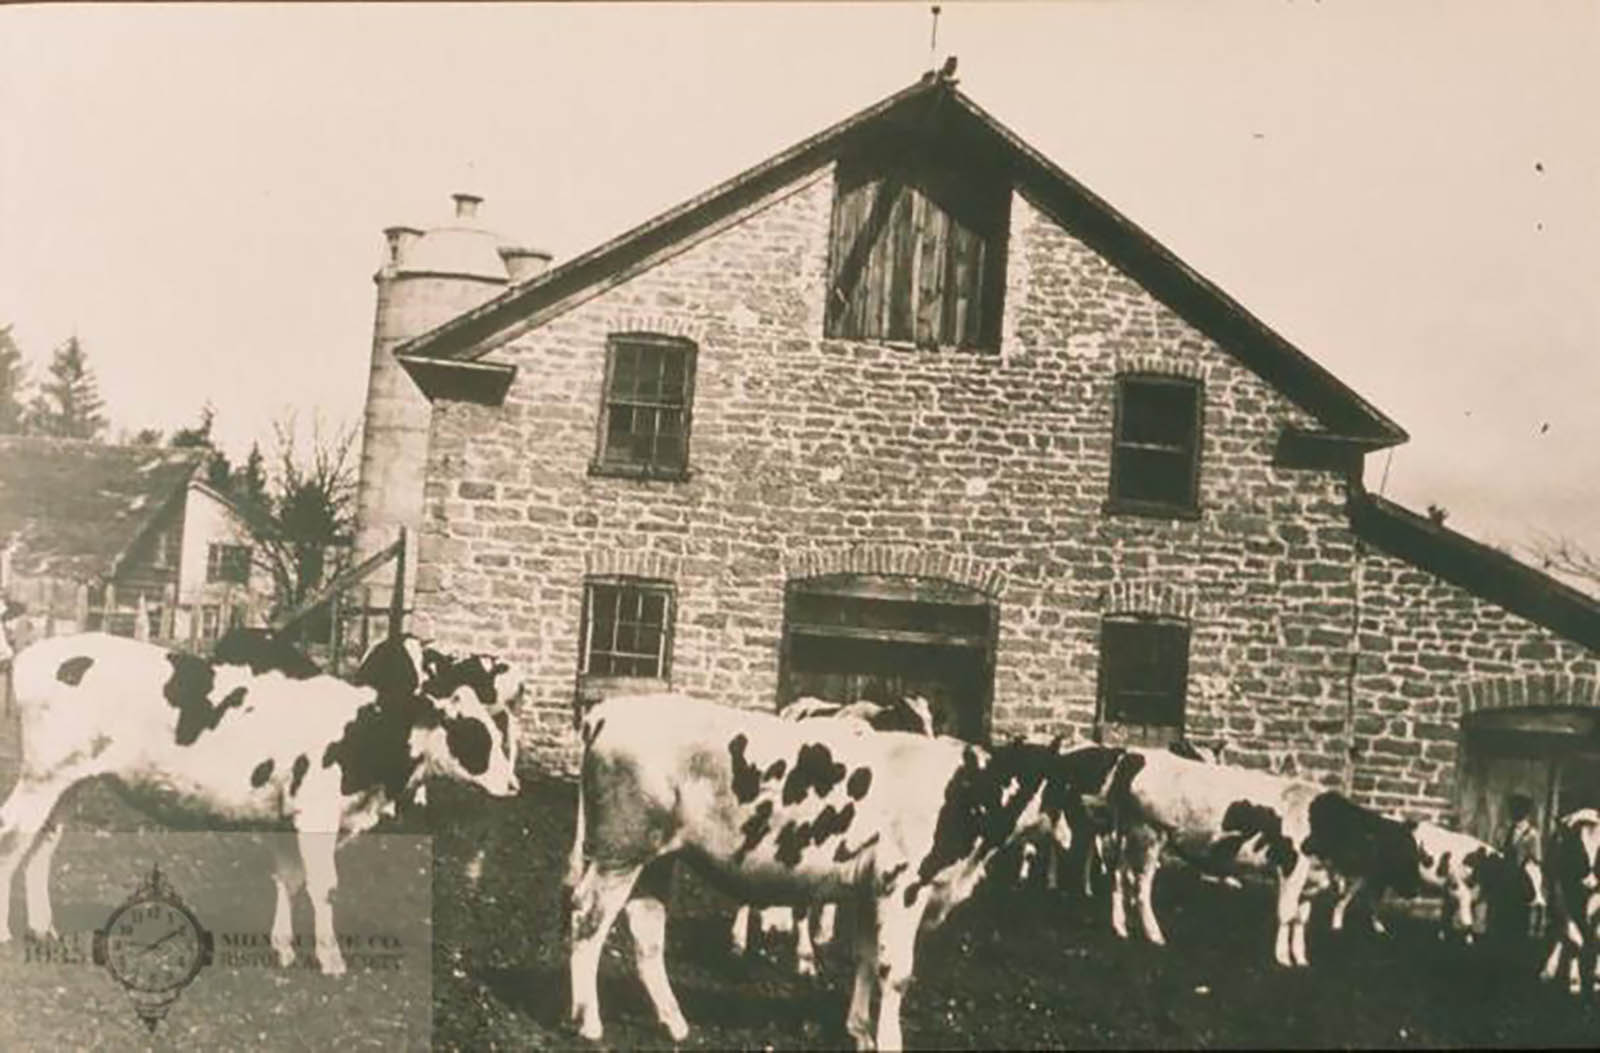 Trimborn Farm stone barn